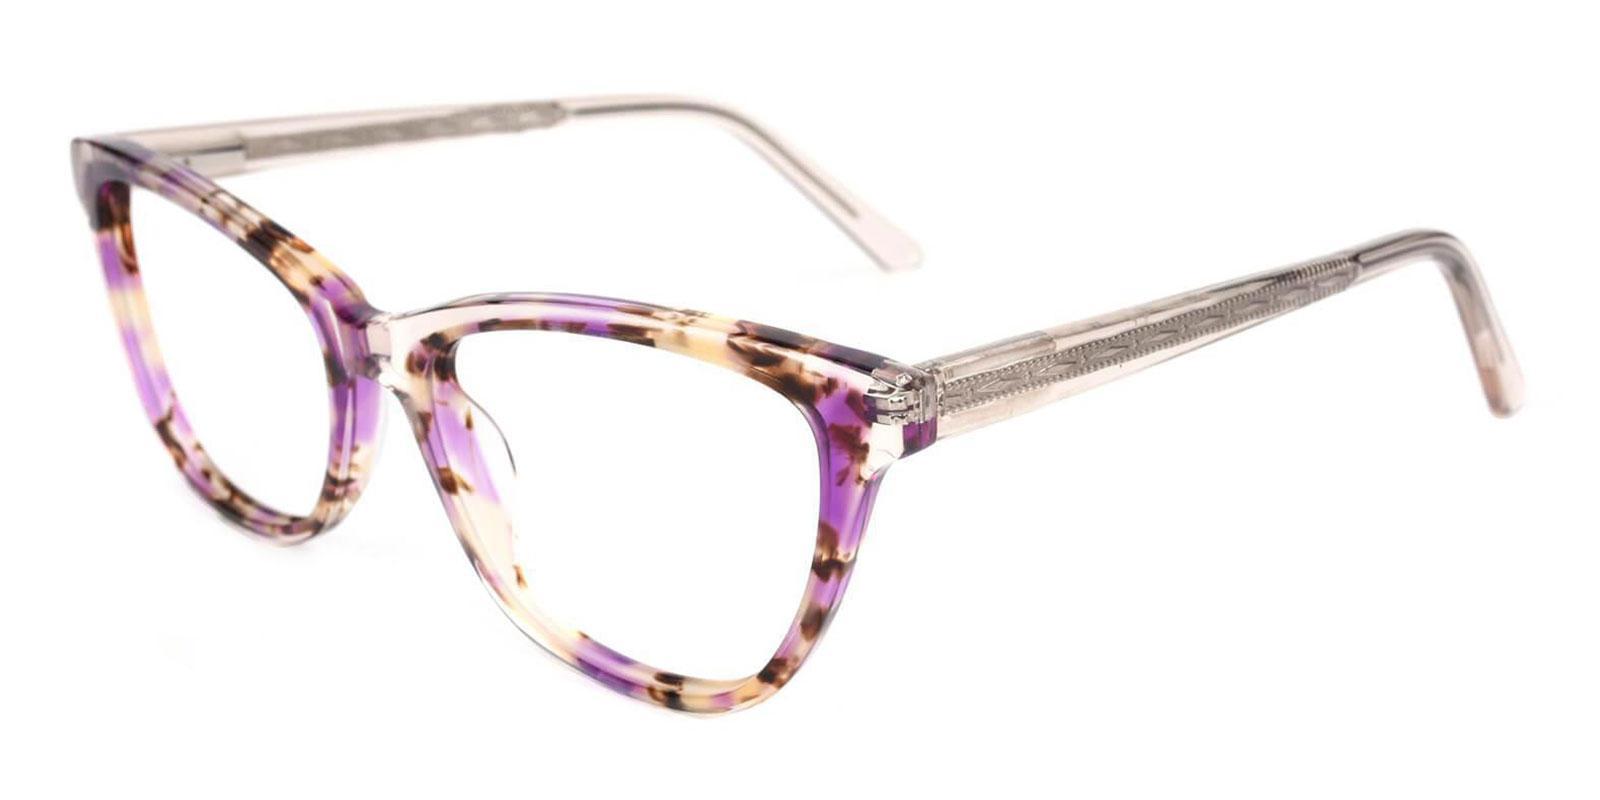 Strauss Purple Acetate Eyeglasses , UniversalBridgeFit Frames from ABBE Glasses